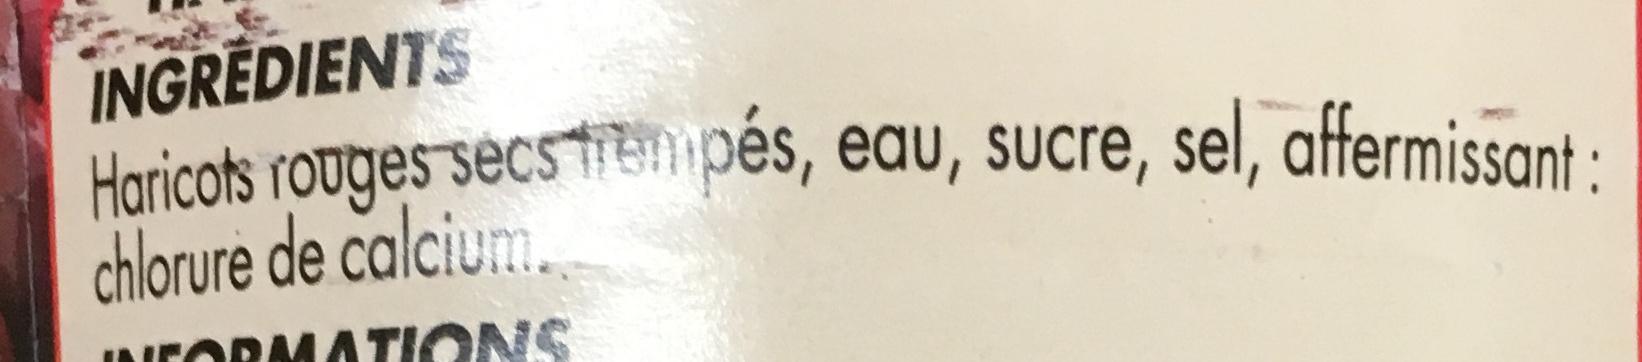 Haricots rouges - Ingrediënten